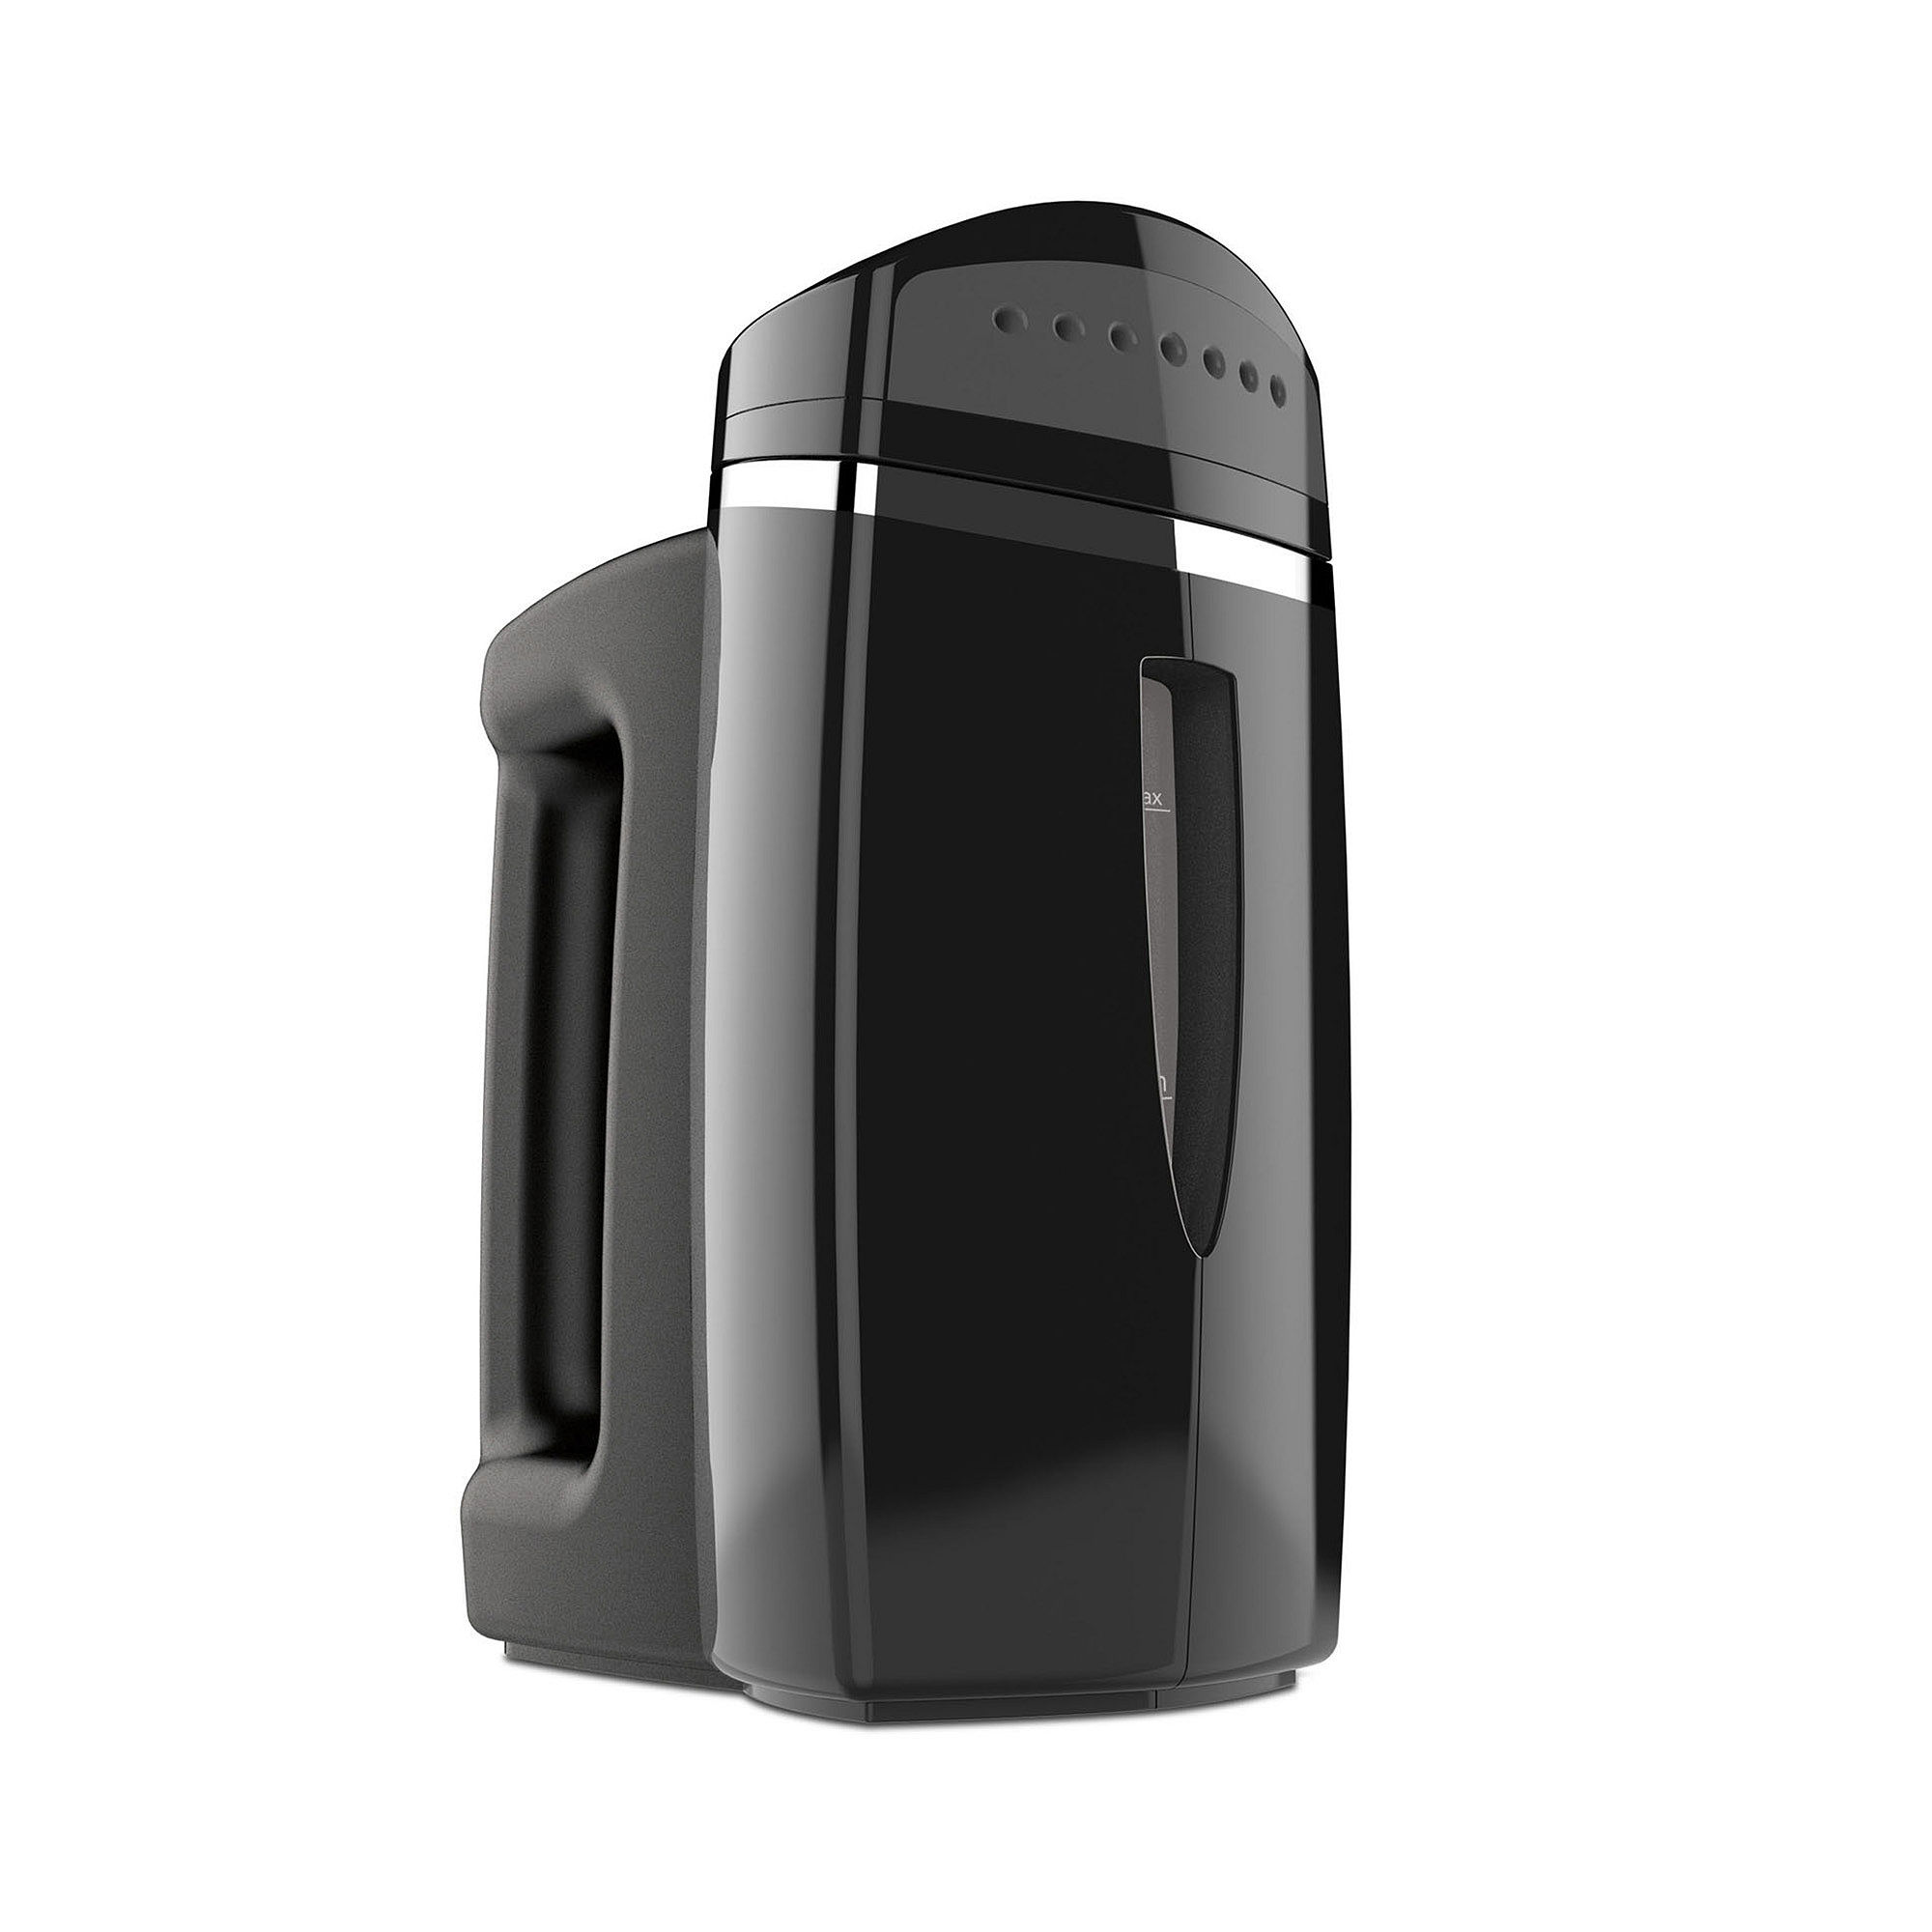 Vornado VS-410 Essential Fabric Steamer